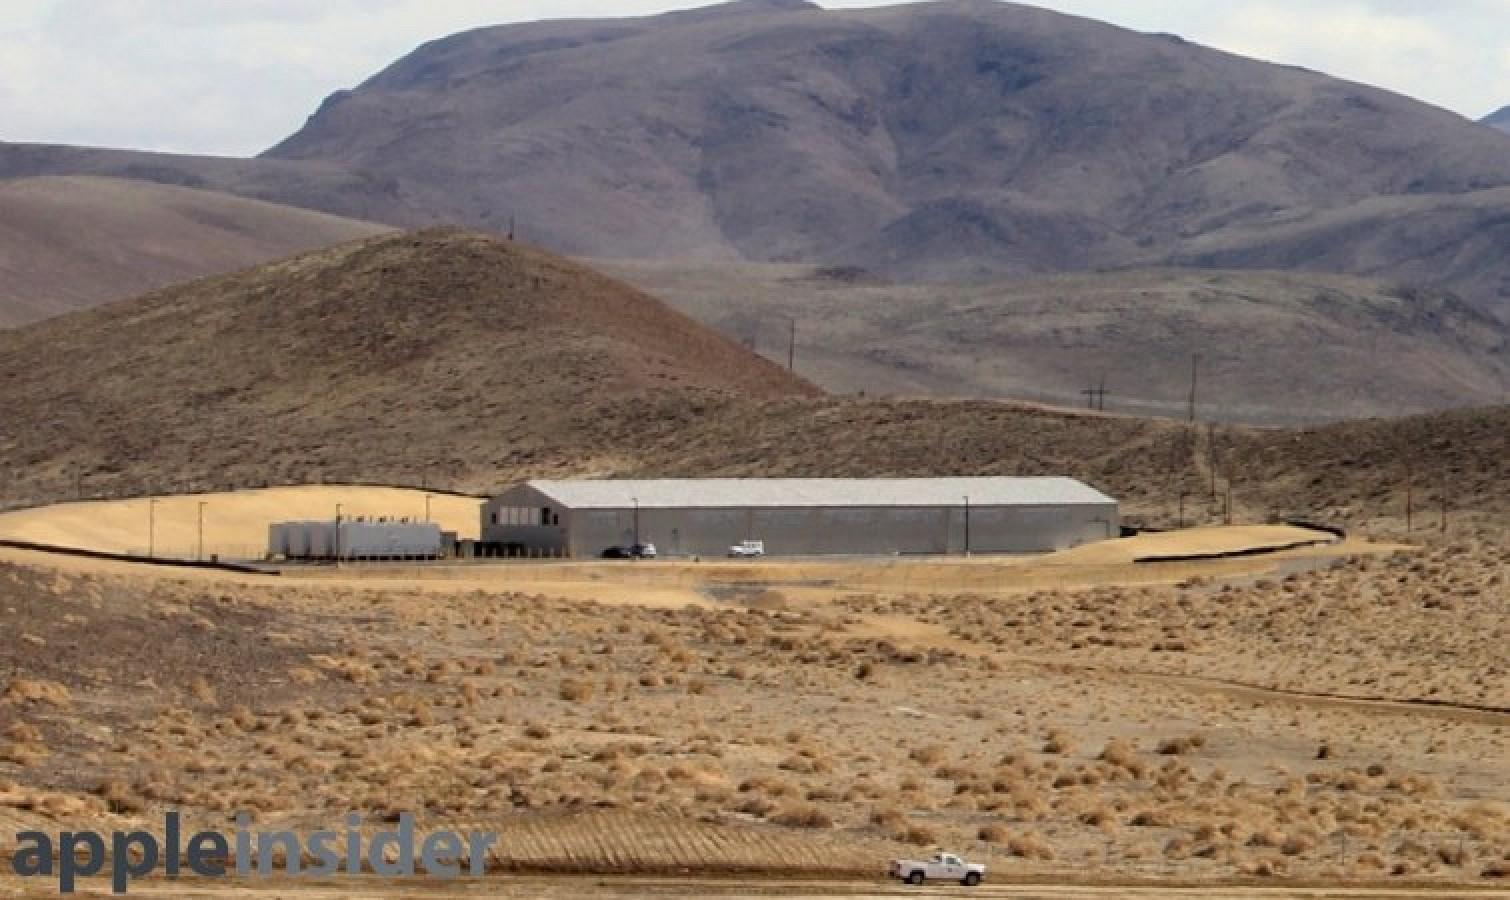 Apple To Build Solar Panel Farm For Reno Data Center